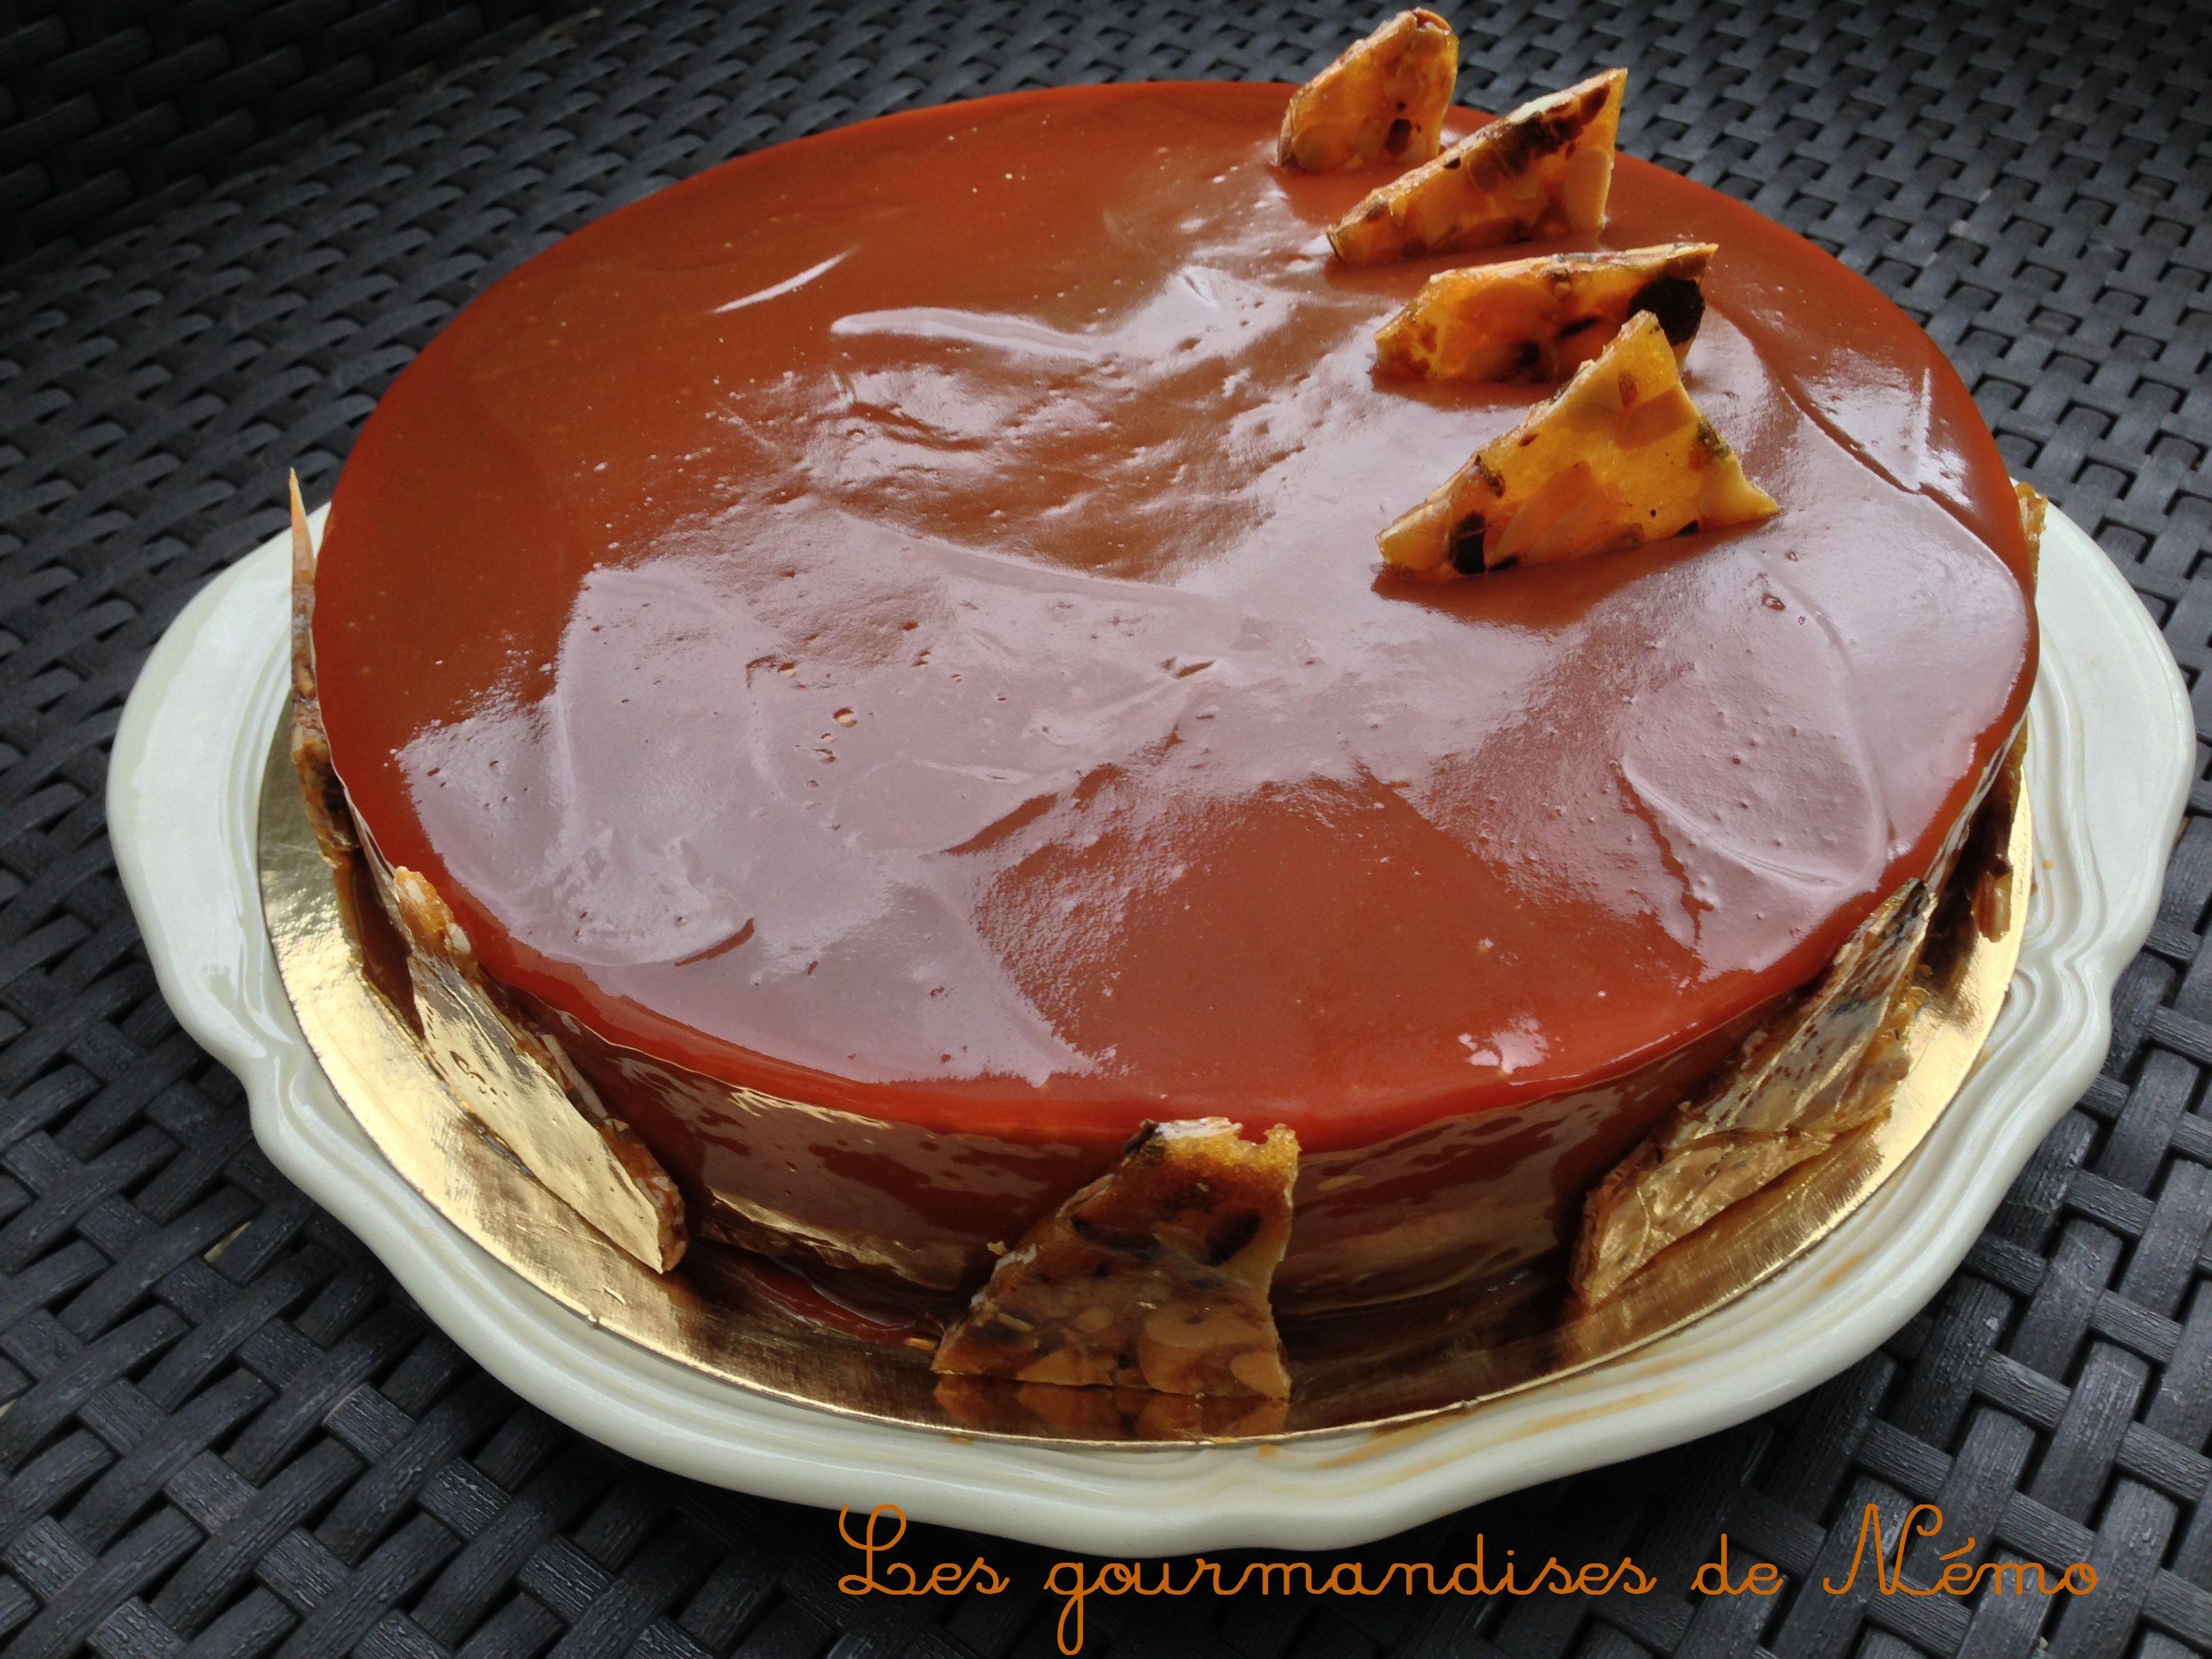 entremet caramel, insert moelleux caramel, nougatine et glaçage miroir caramel, glaçage brillant caramel